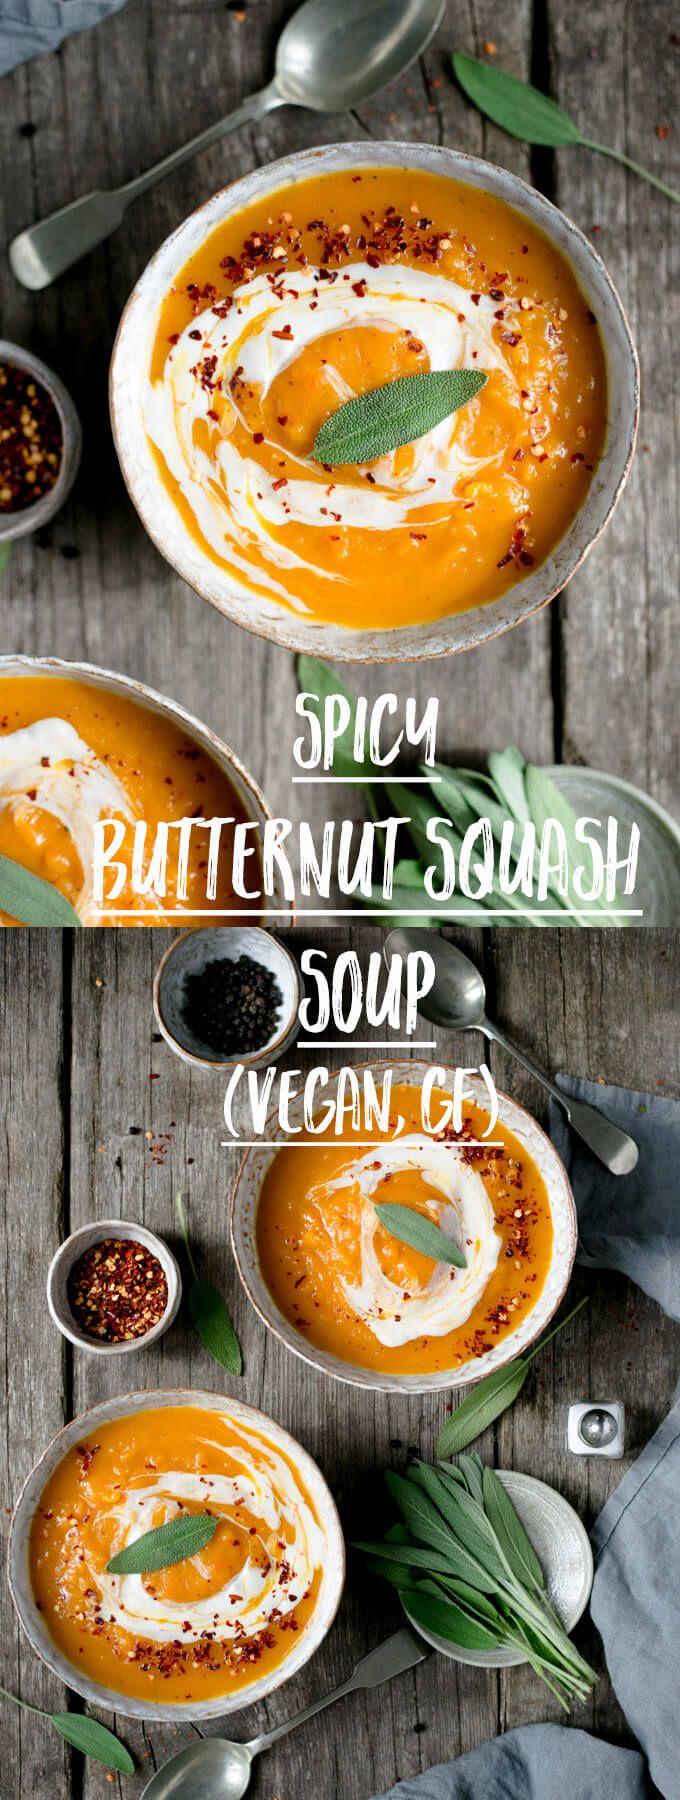 Delicious, velvety smooth spicy butternut squash soup! #vegan #glutenfree #soup #butternutsquash   via @annabanana.co